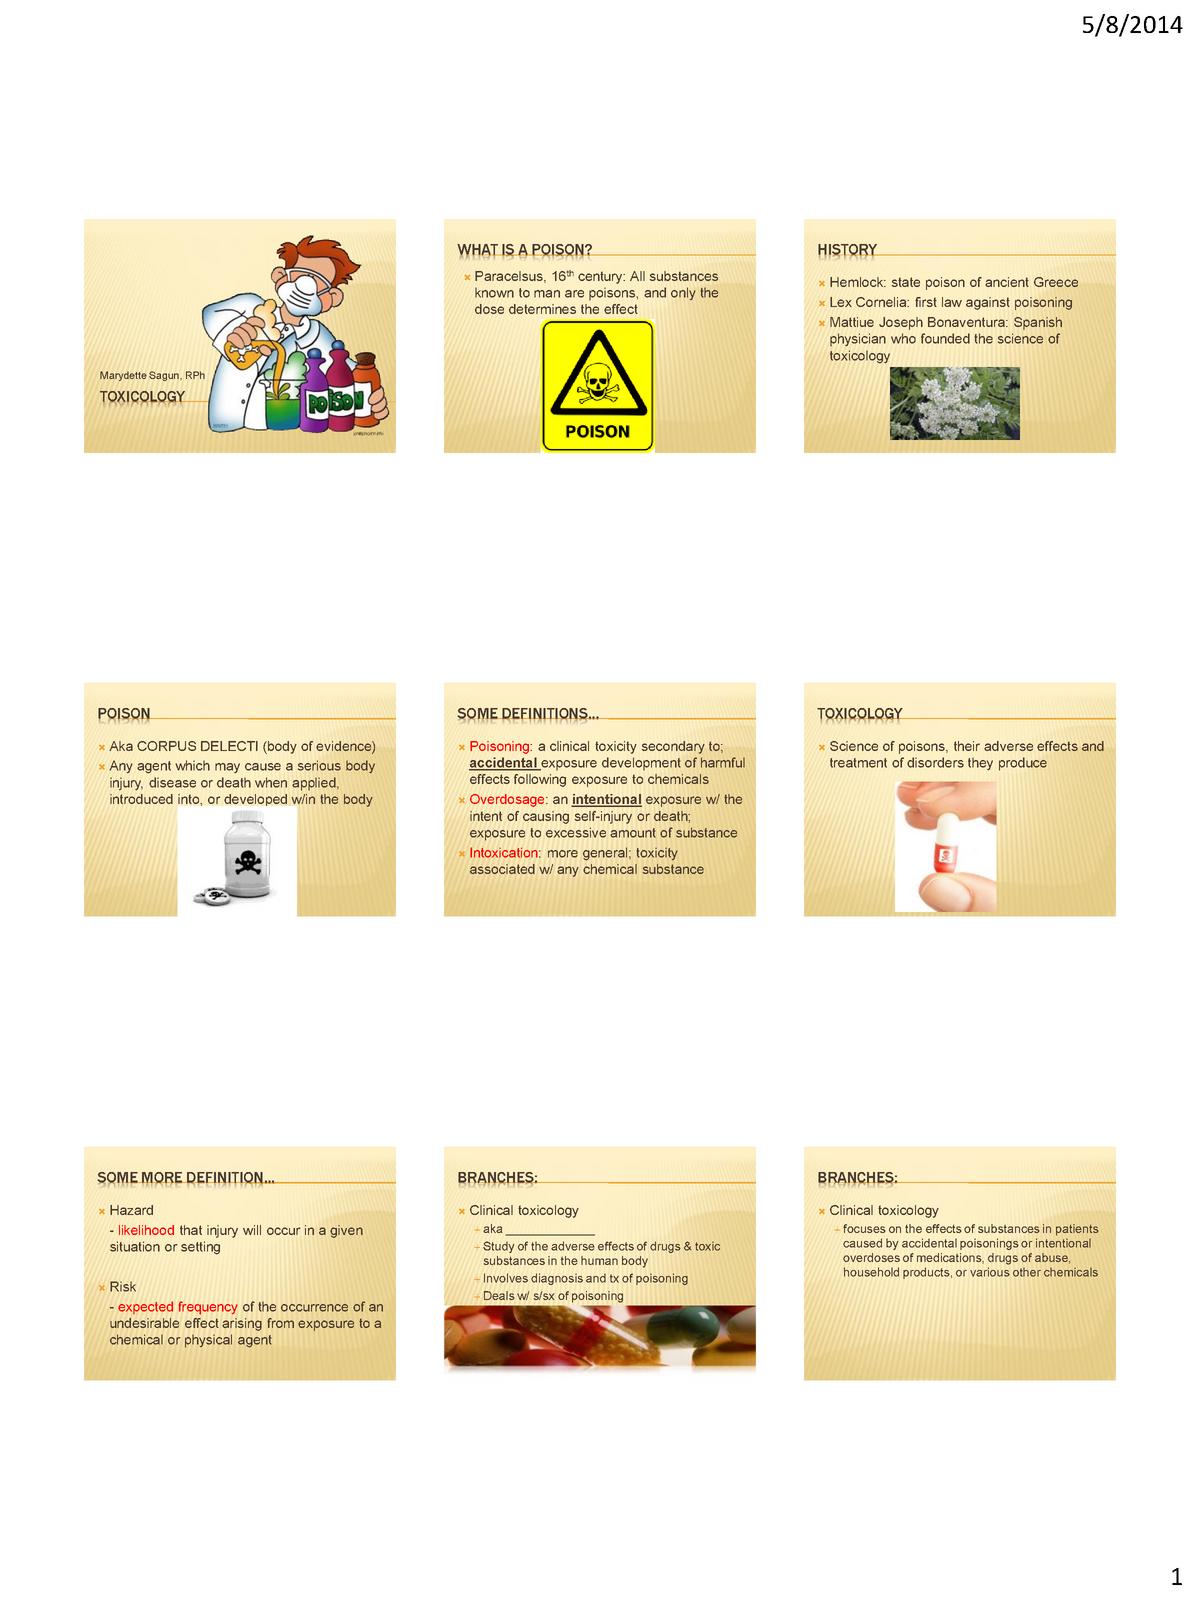 Toxicology - PHARM 3229L: Pharmaceutical Toxicology - StuDocu